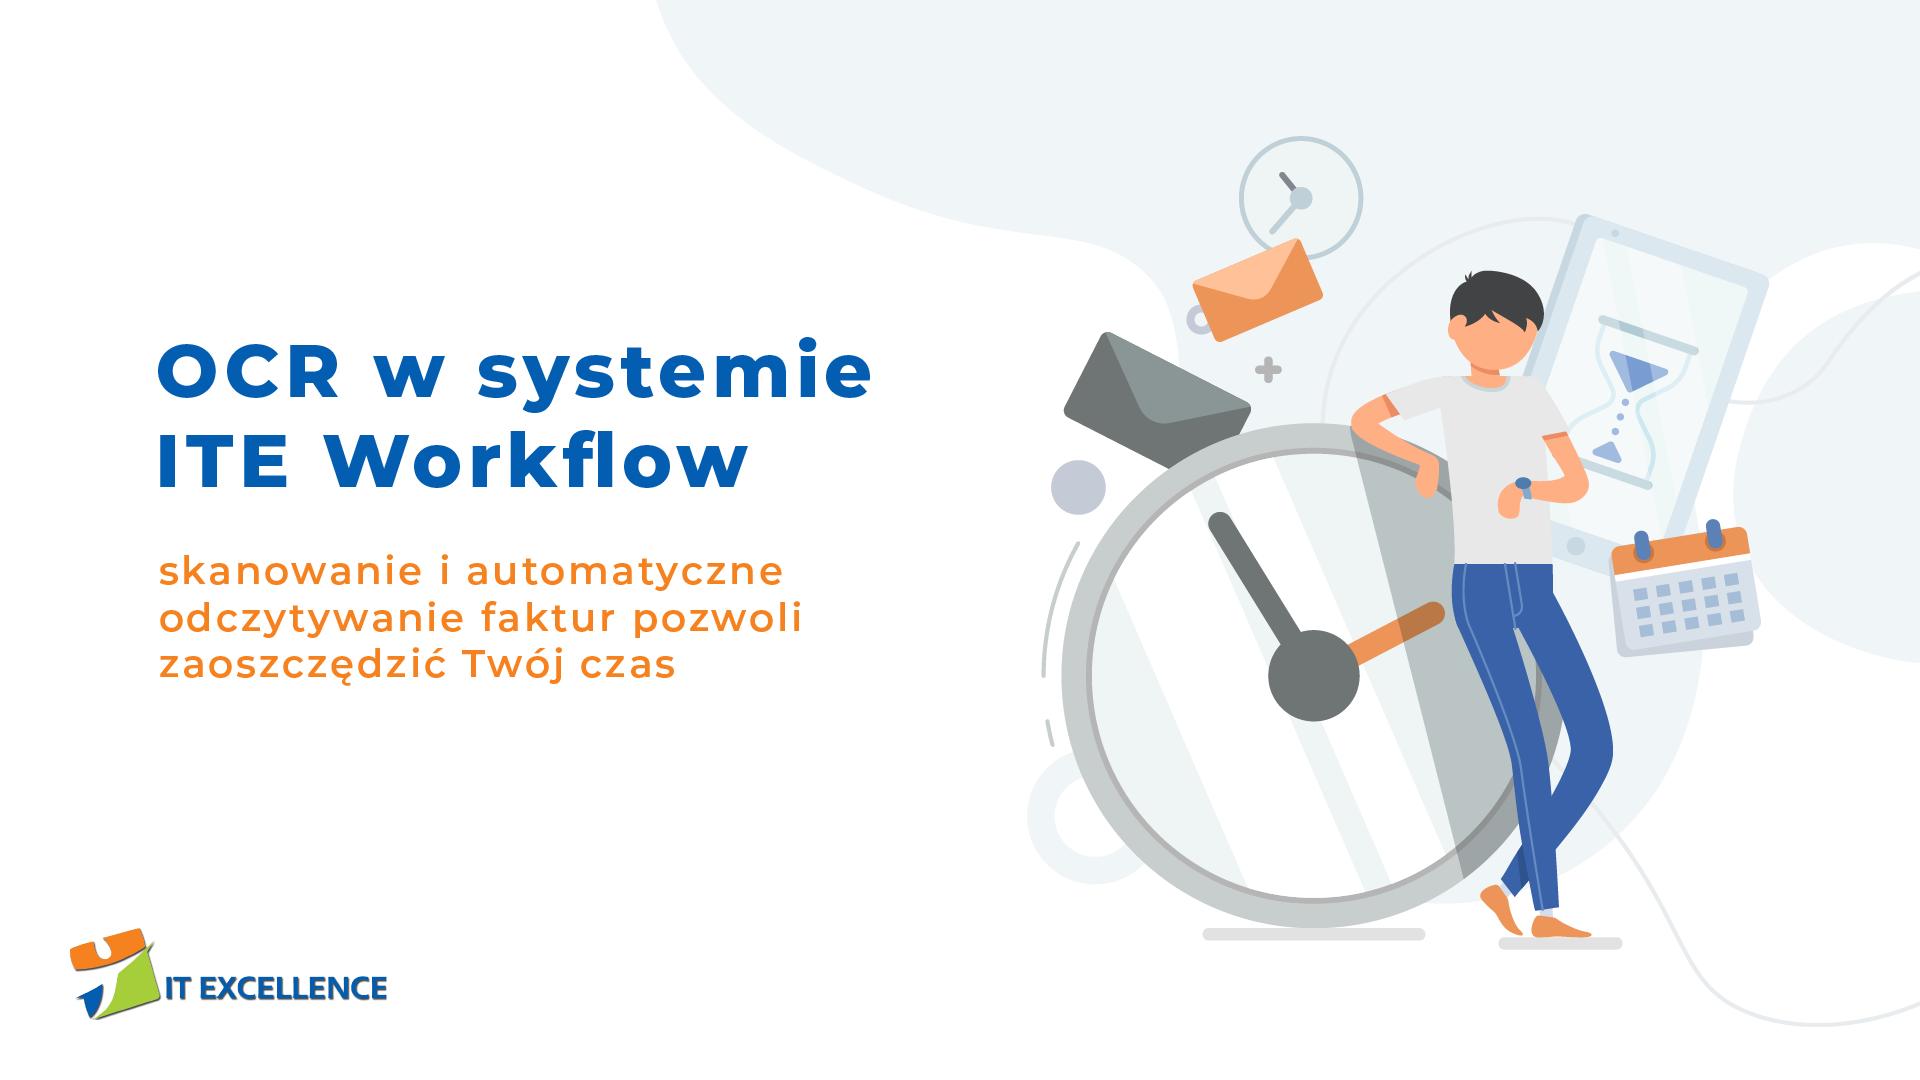 ocr wsystemie ITE Workflow